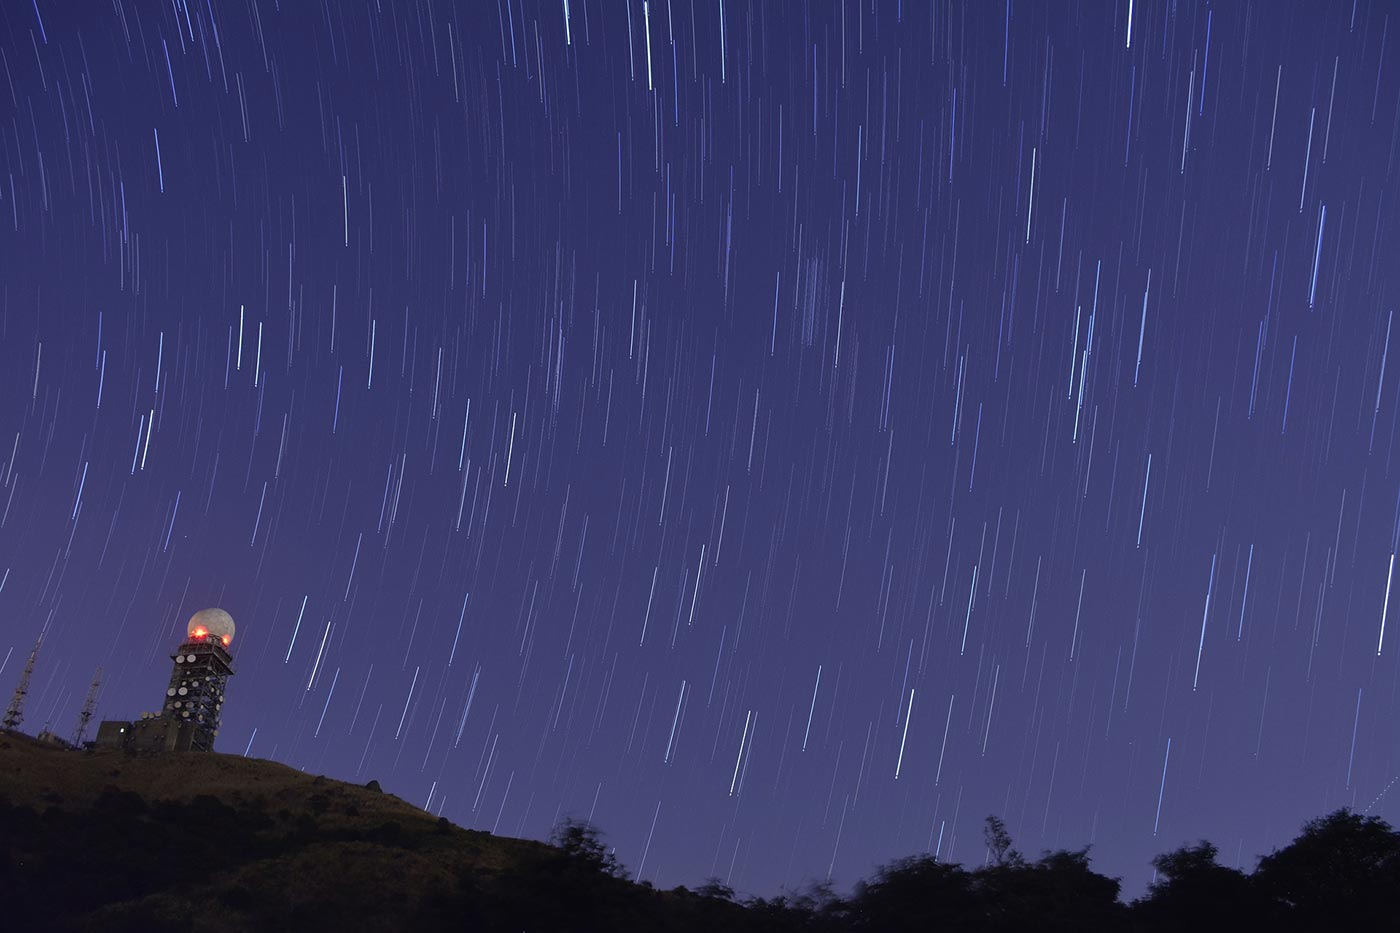 Time-lapse sky